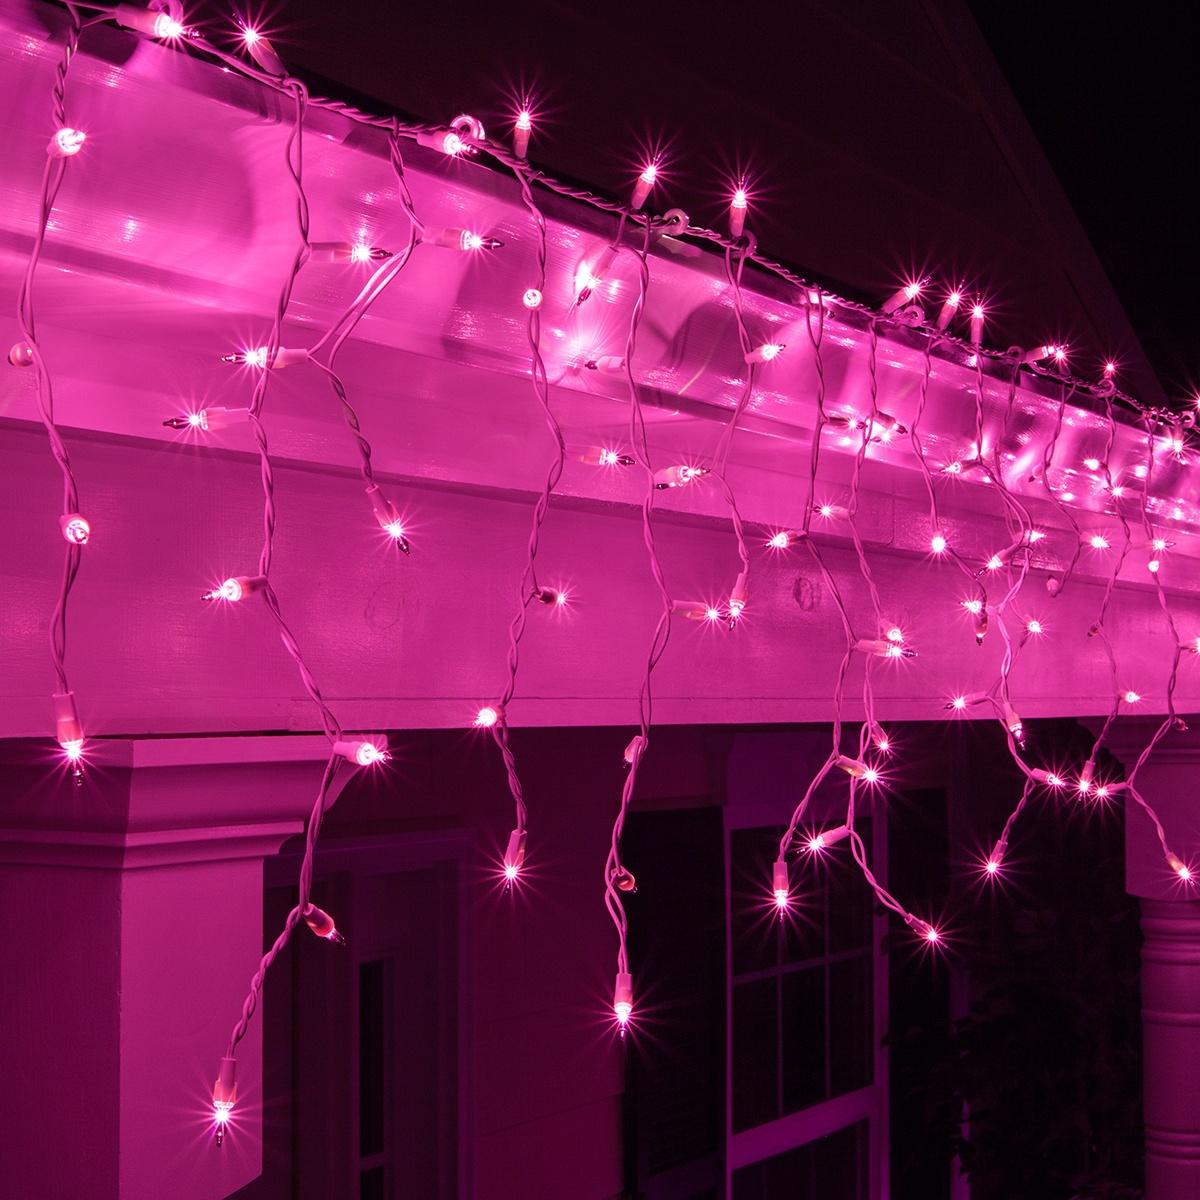 Pink White Wire Lights - Dolgular.com